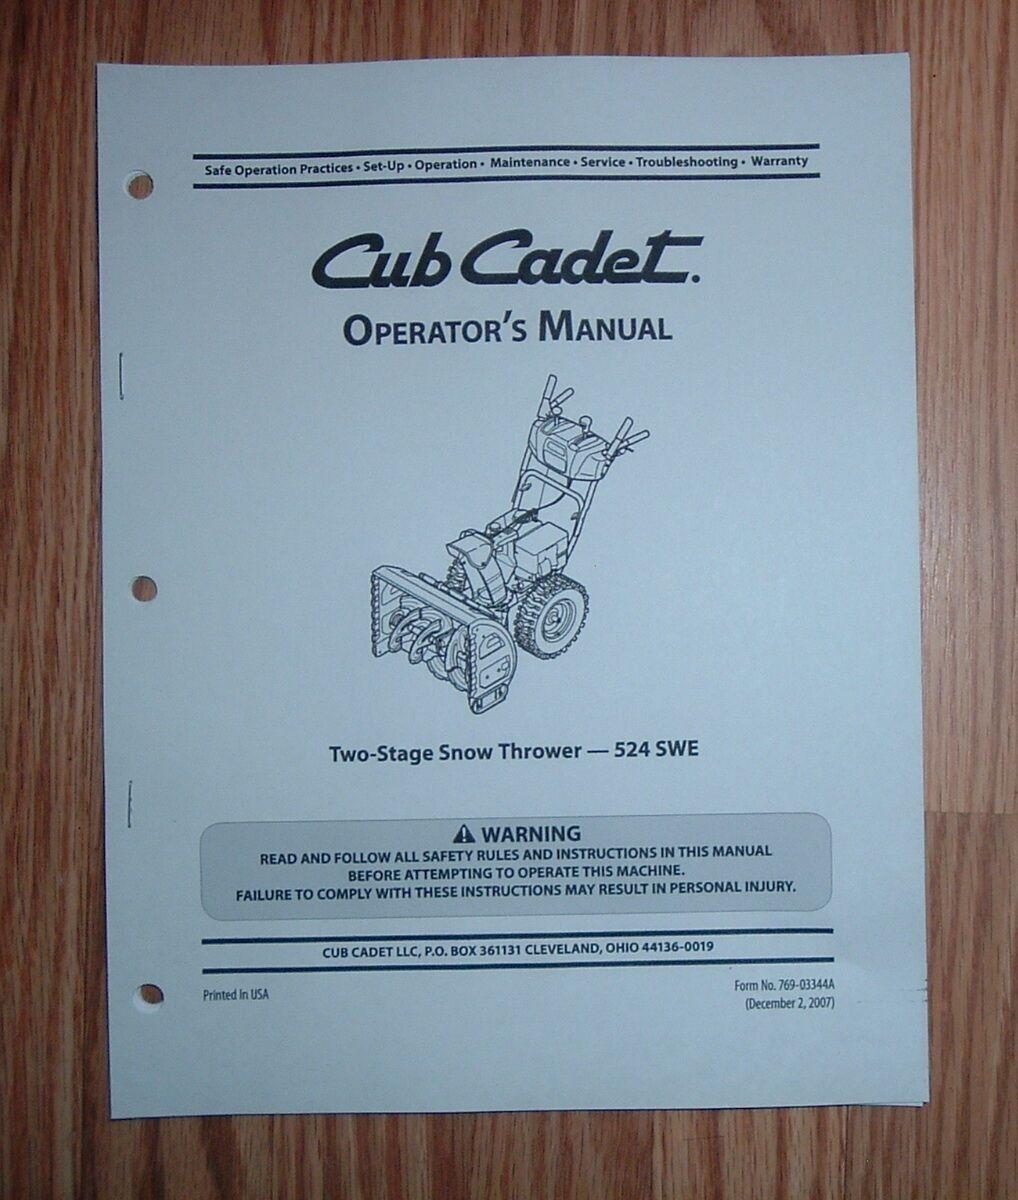 Cub cadet 524 swe snow thrower operator's manual | ebay.